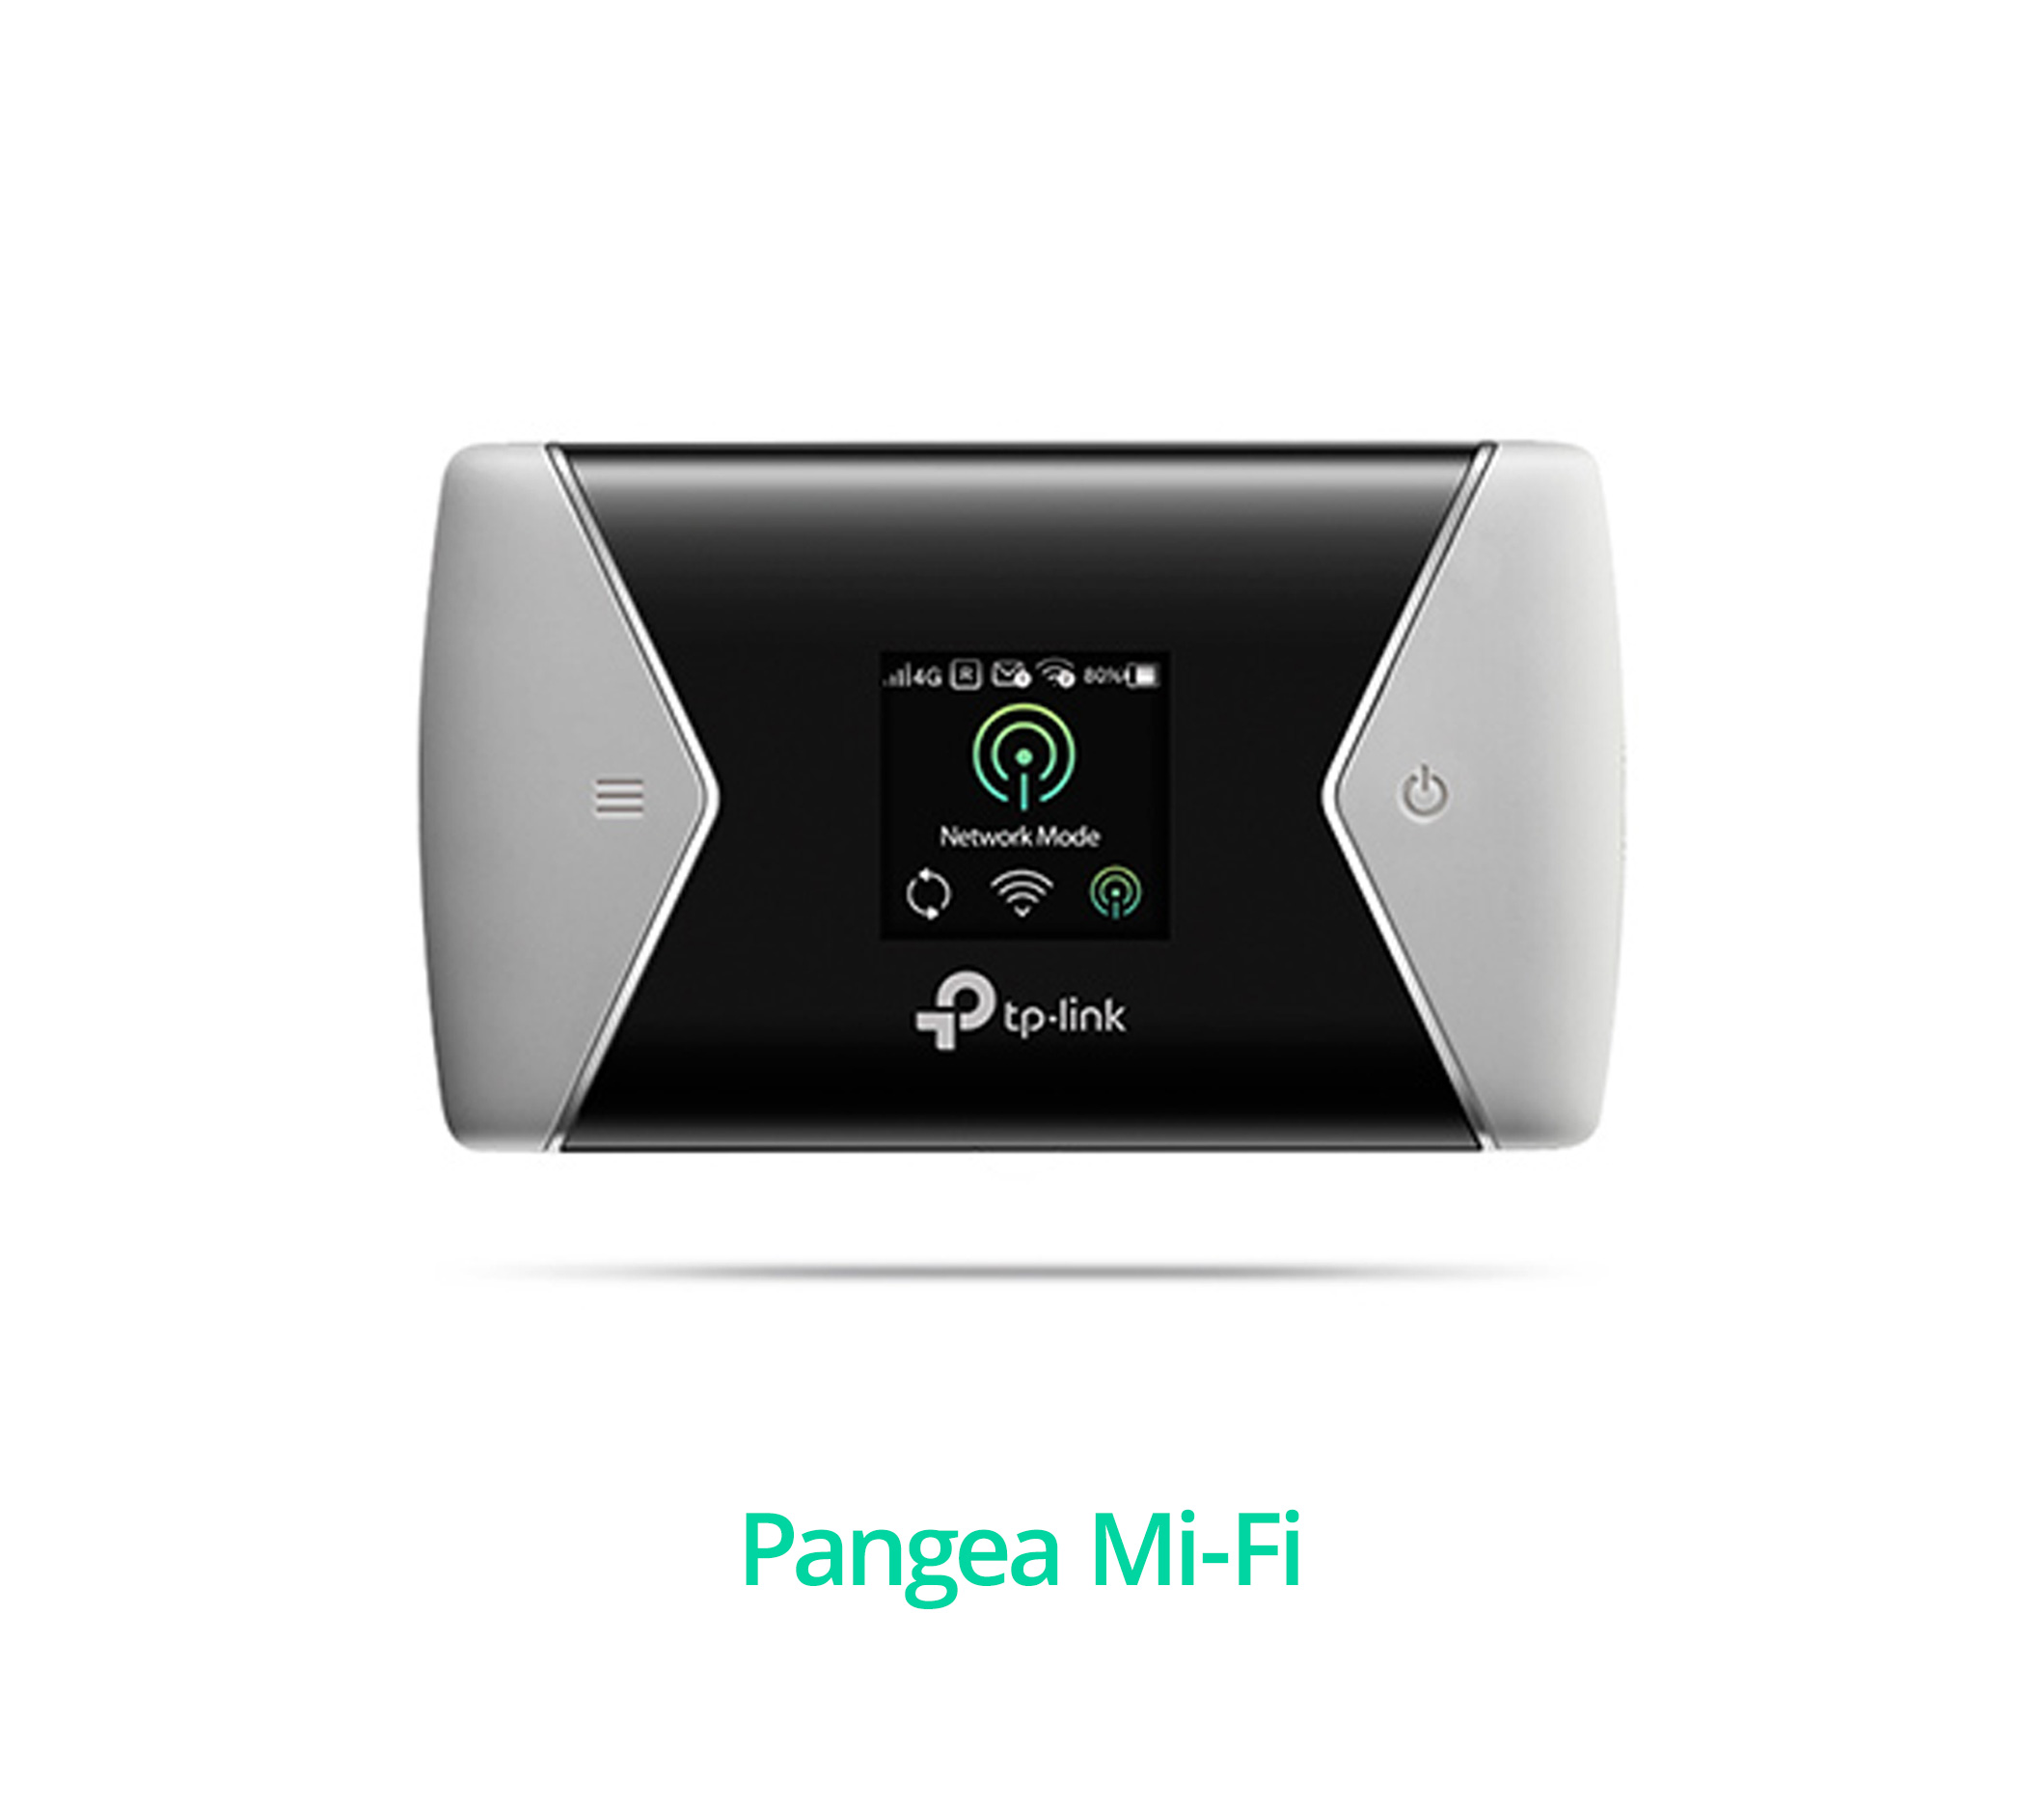 Pangea Enterprise router - Pangea Mi-Fi link